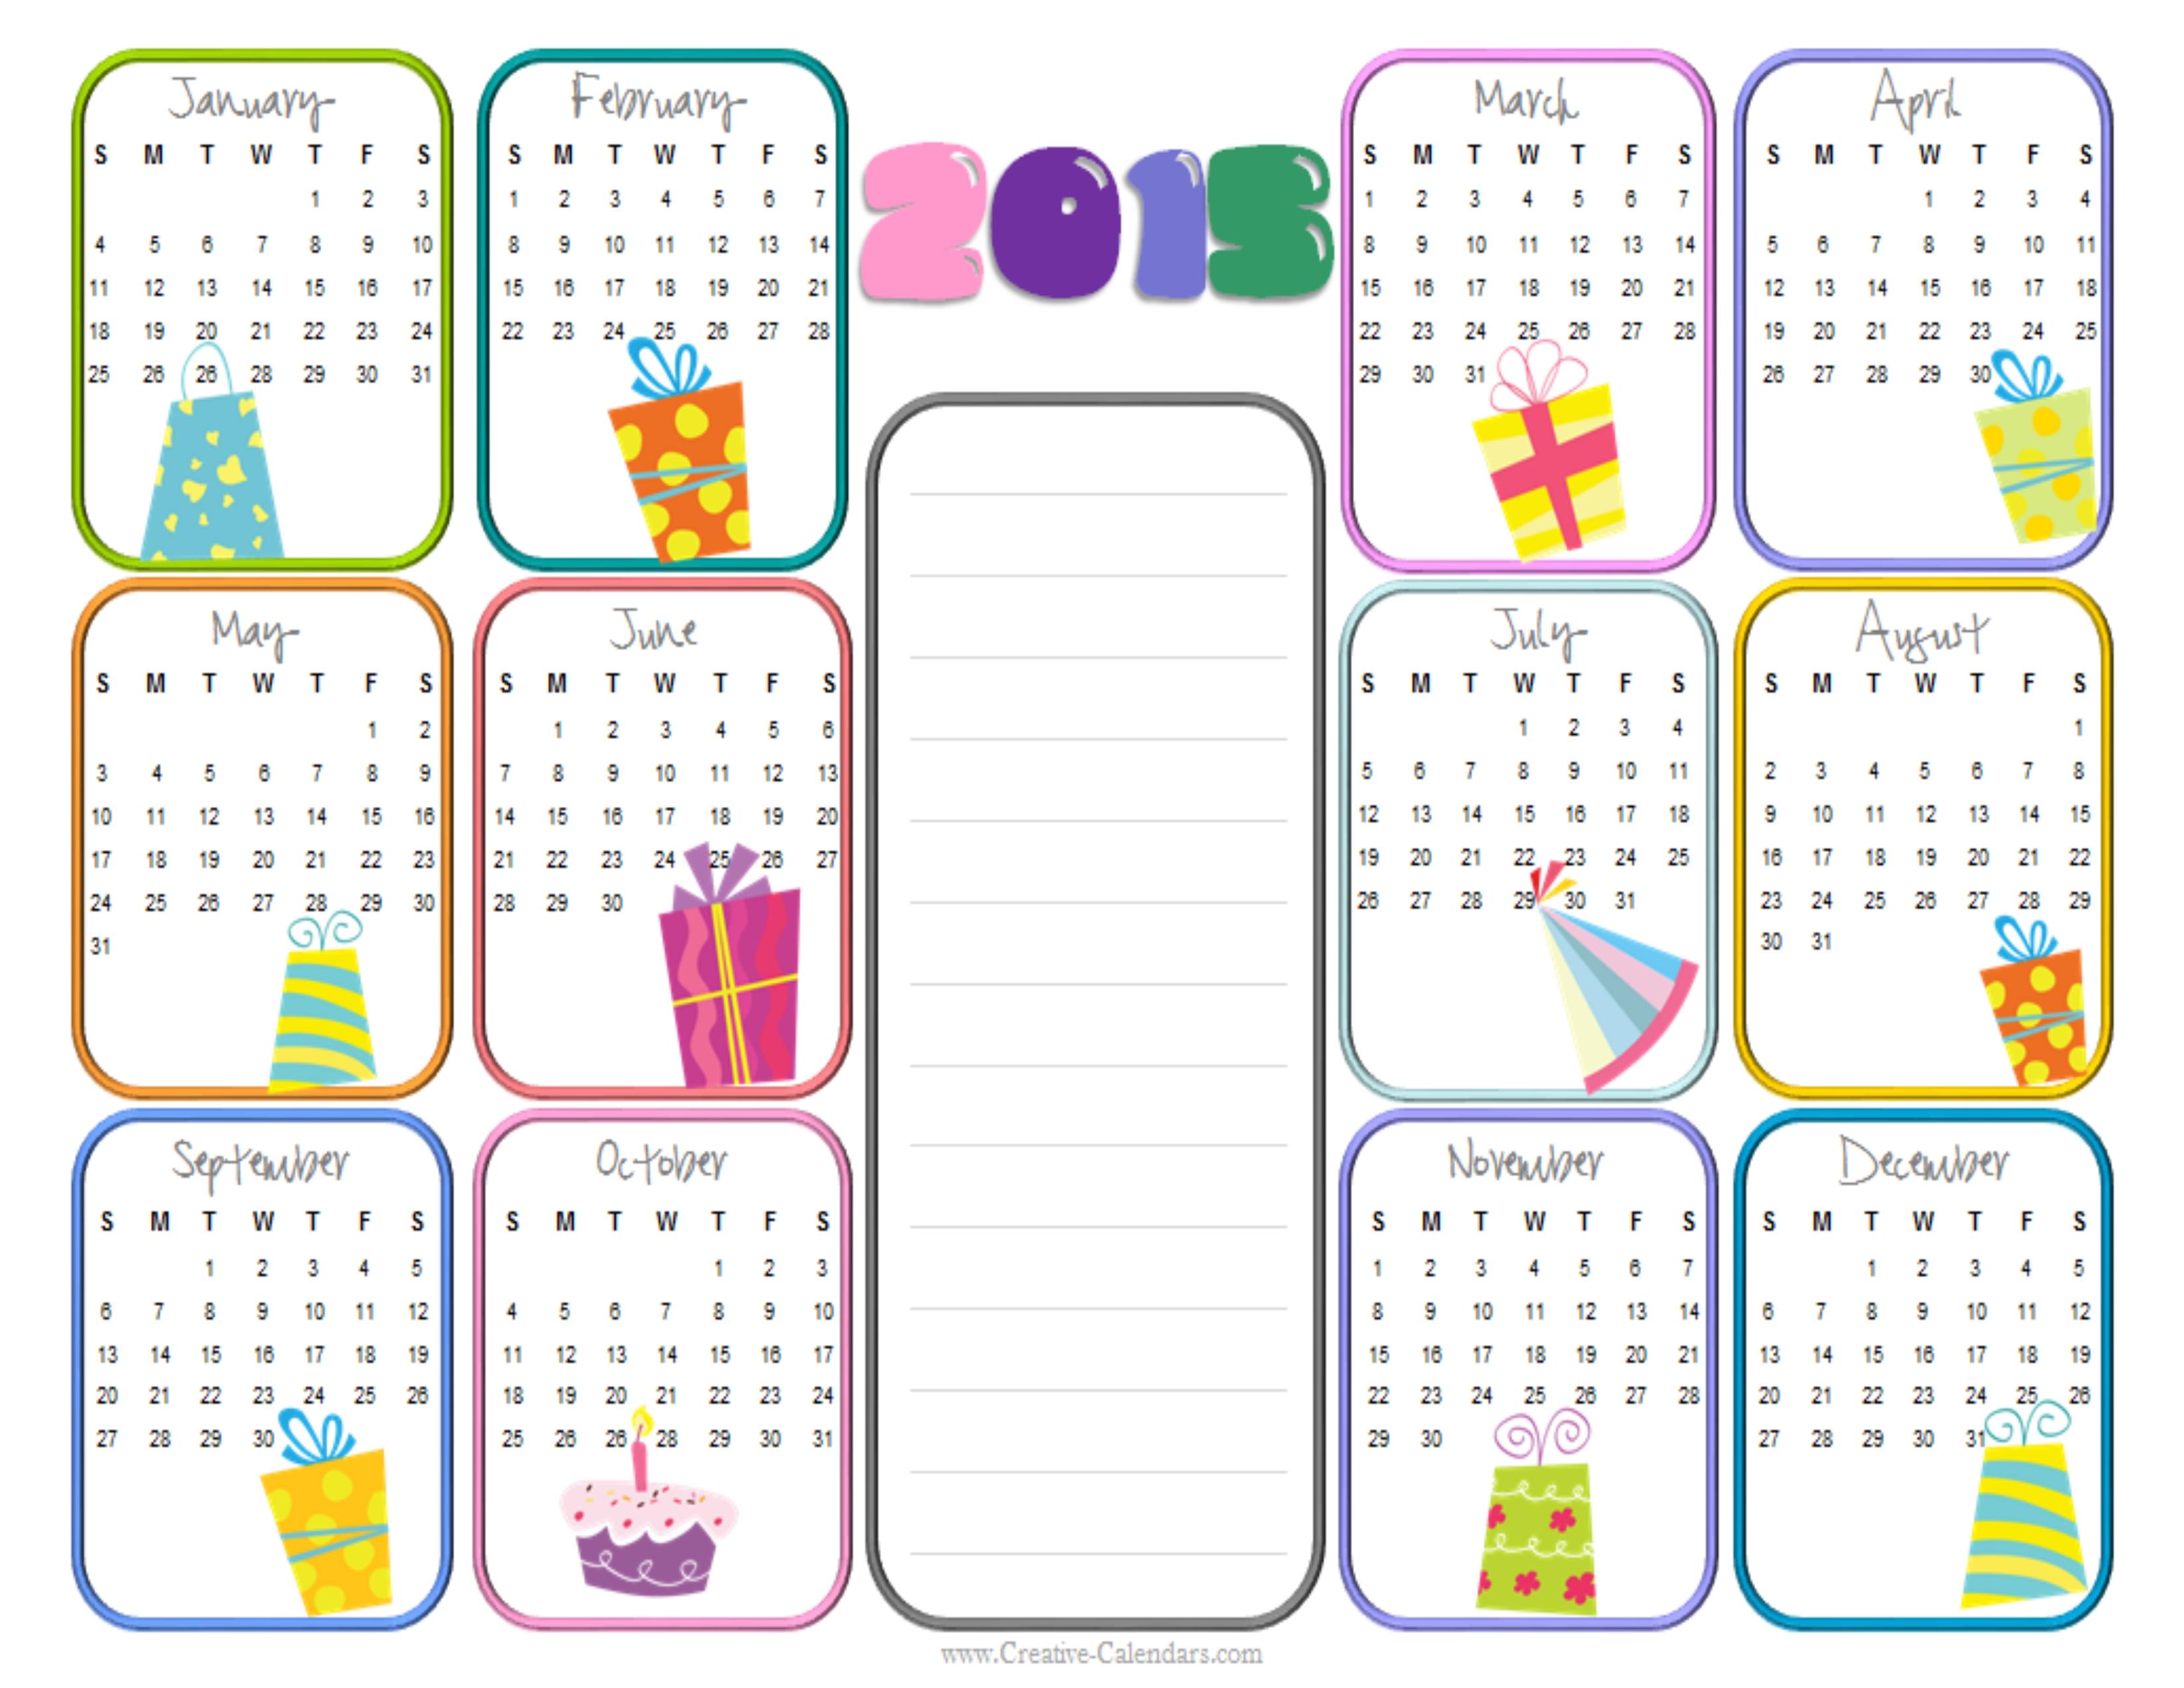 Calendar 2015 Template Free – 2017 printable calendar